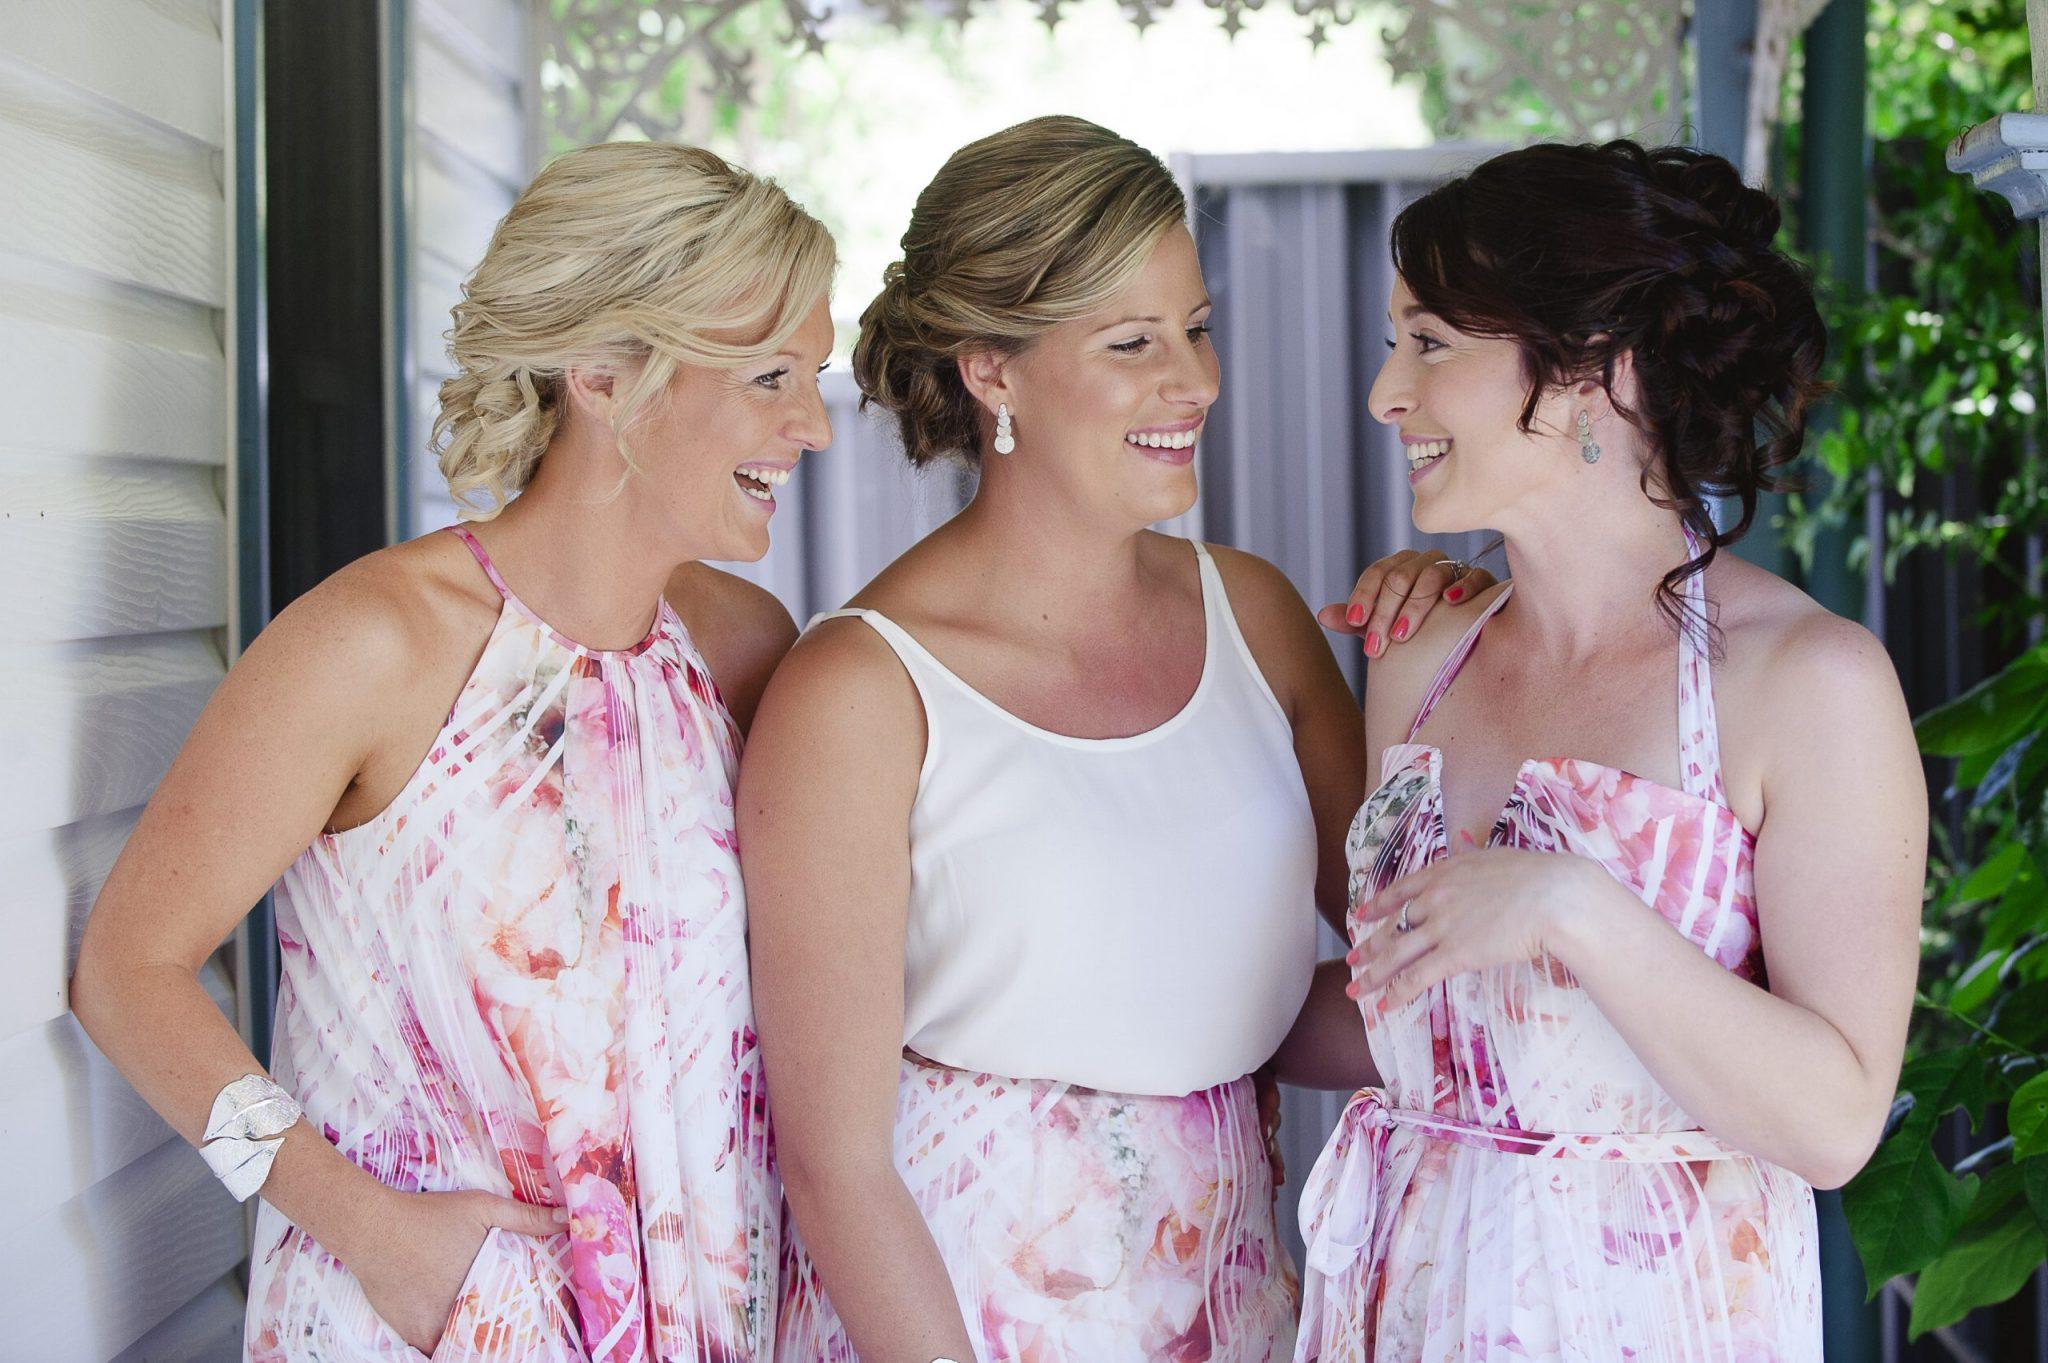 bridesmaids, wedding flowers, vintage suitcase, Daylesford wedding, country wedding, vintage wedding